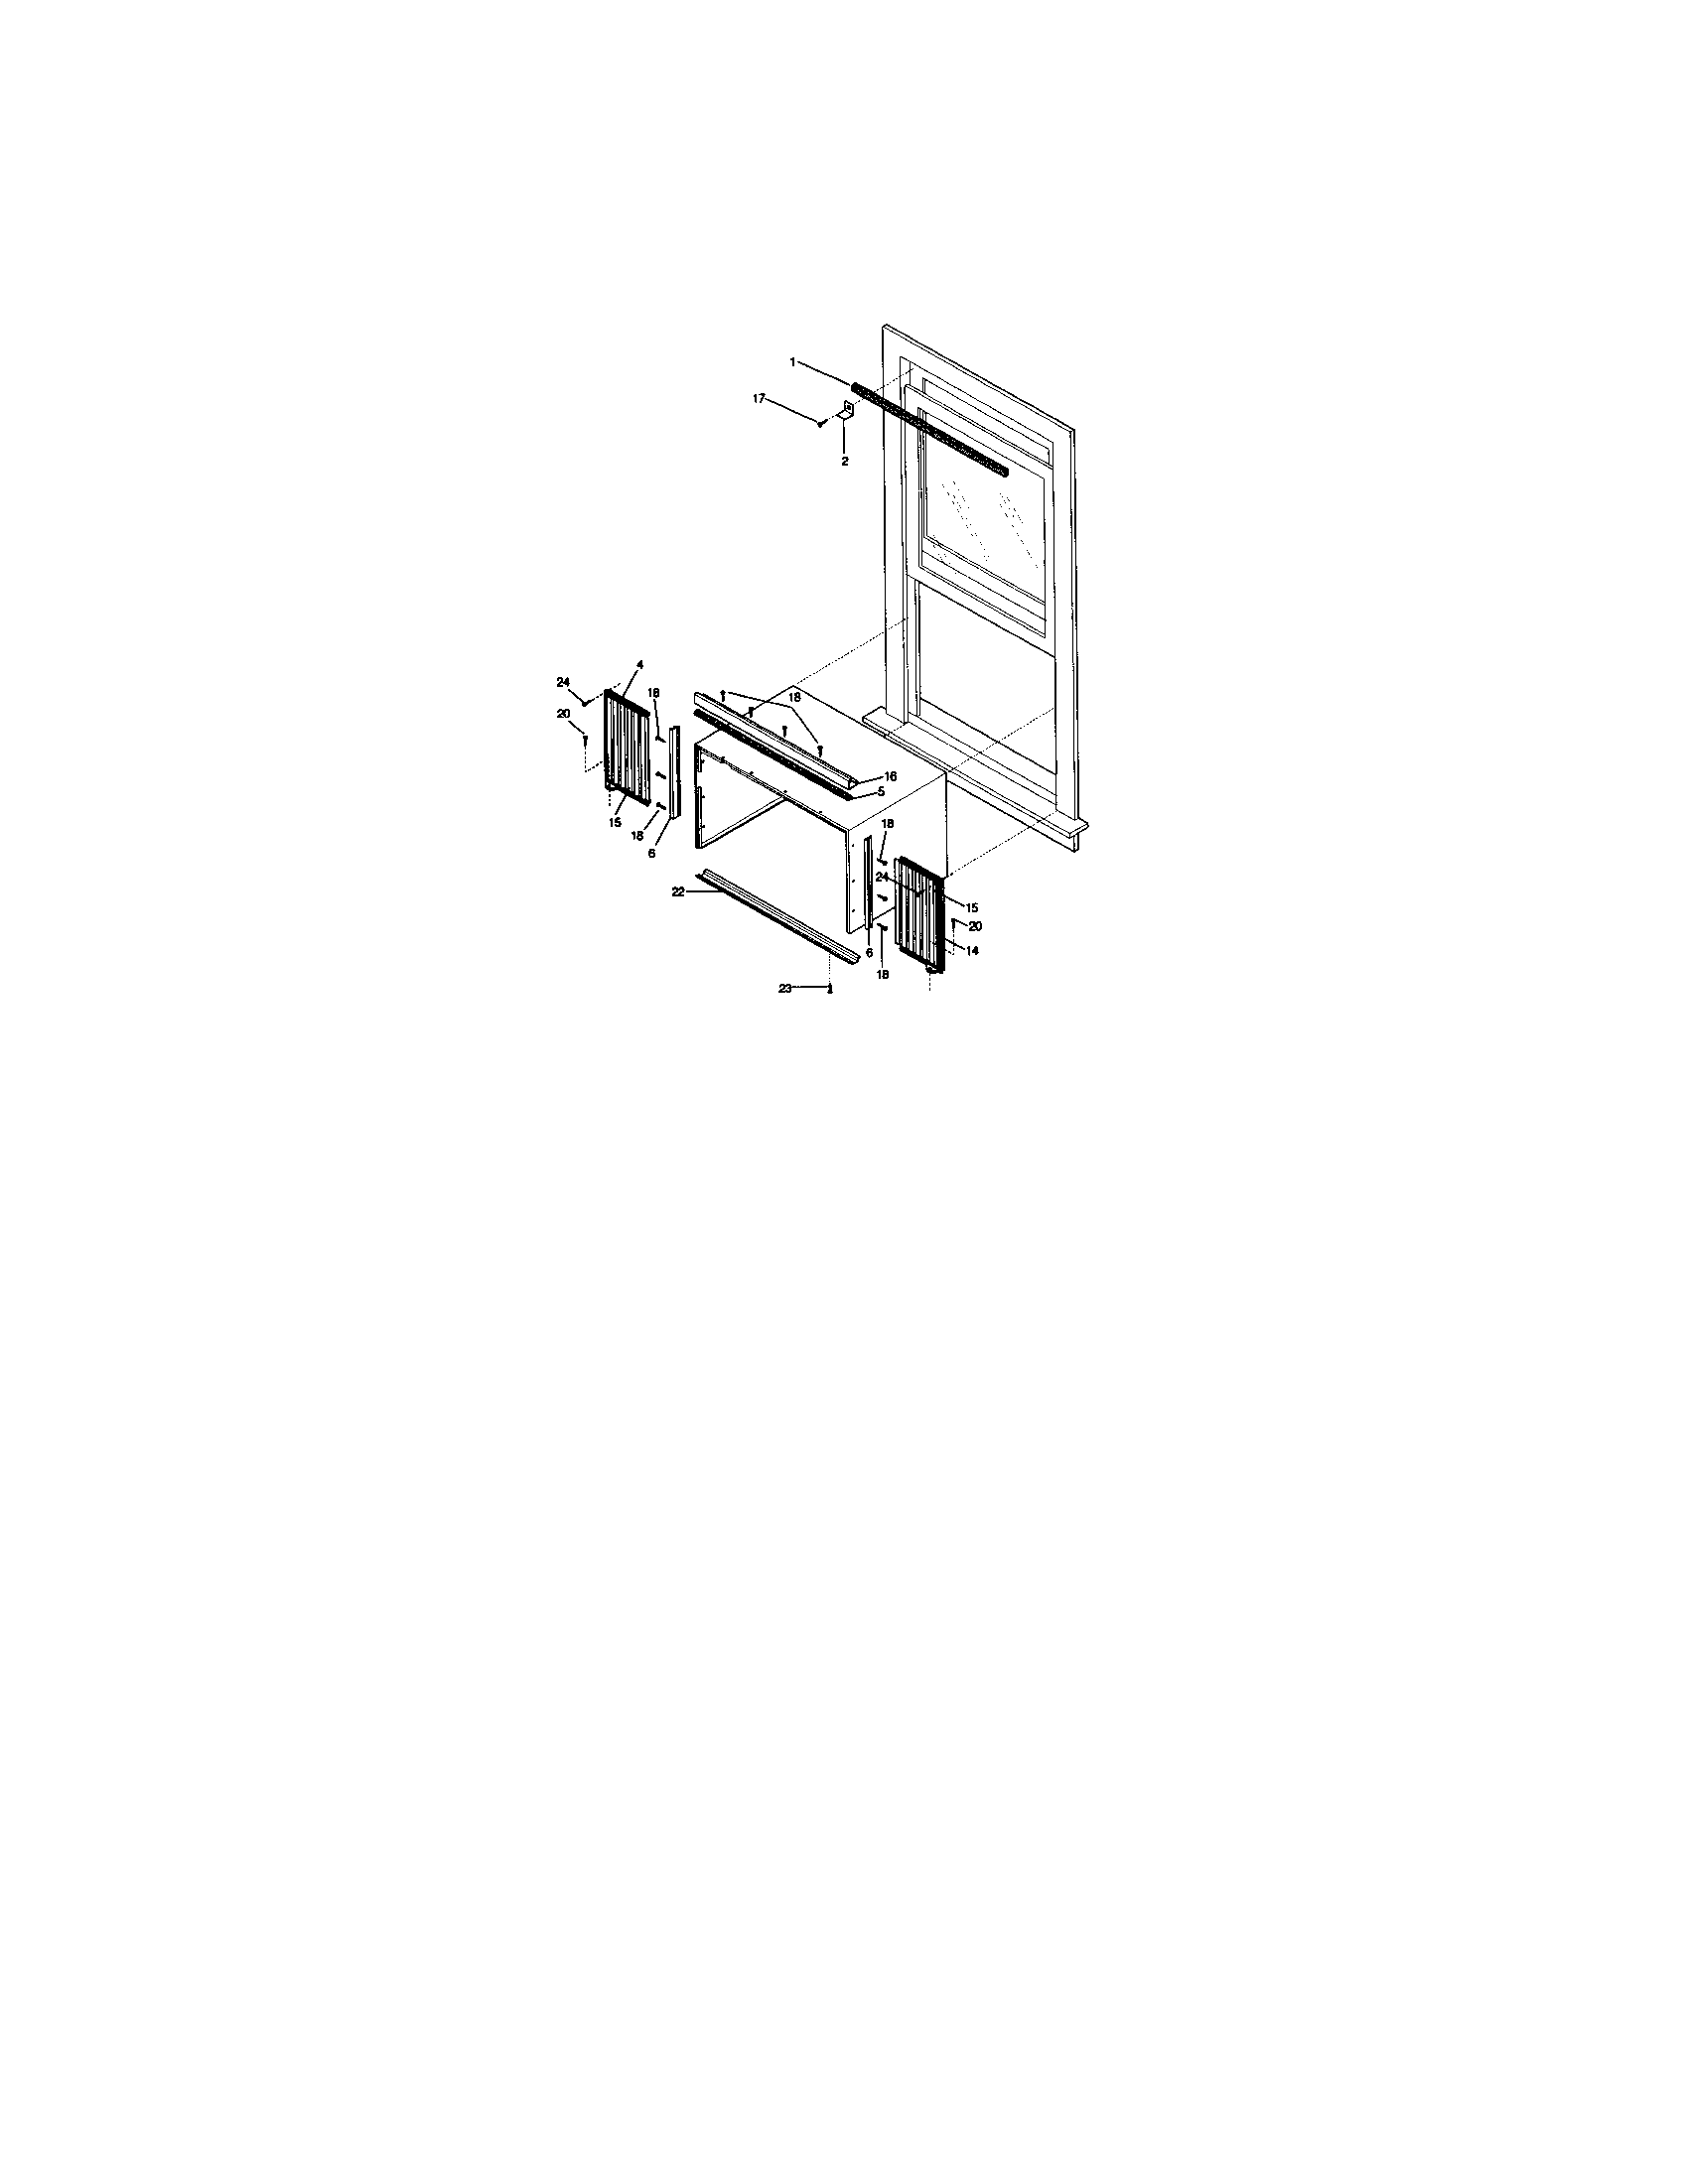 Fujitsu Heat Pump Wiring Diagram Fujitsu Heat Pump